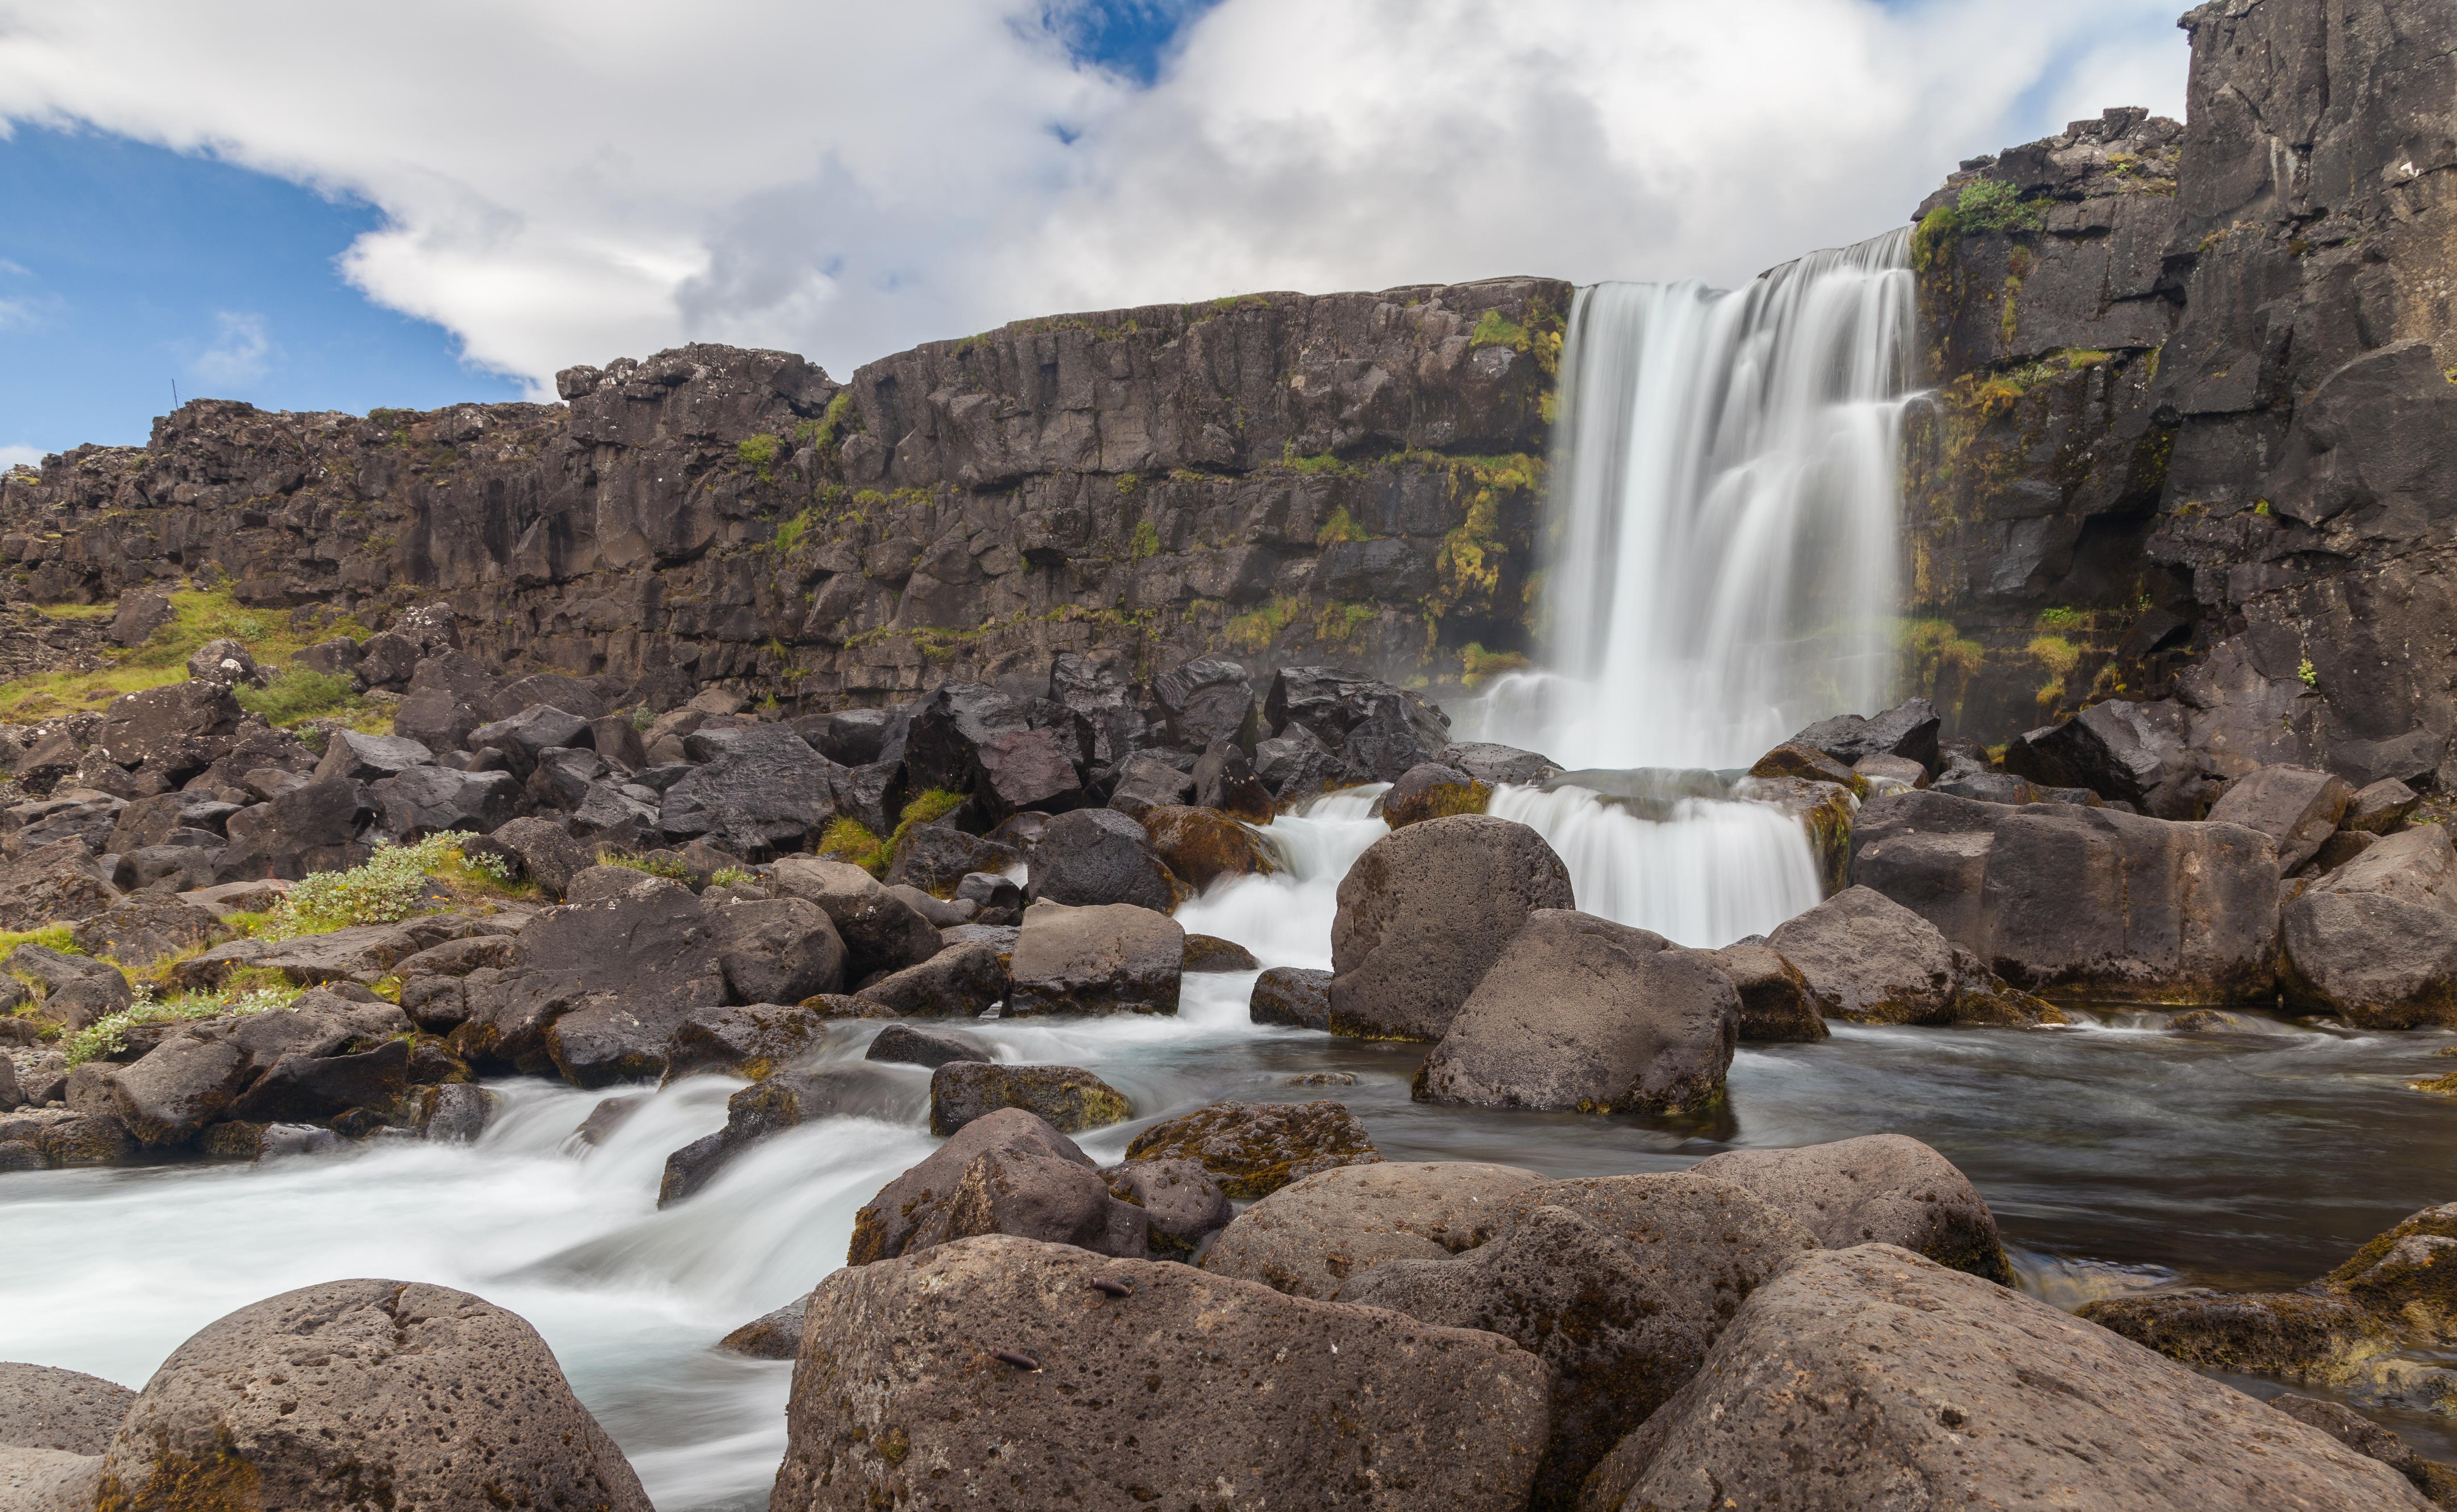 Öxarárfoss, Parque Nacional de Þingvellir, Suðurland, Islandia, 2014-08-16, DD 029.JPG